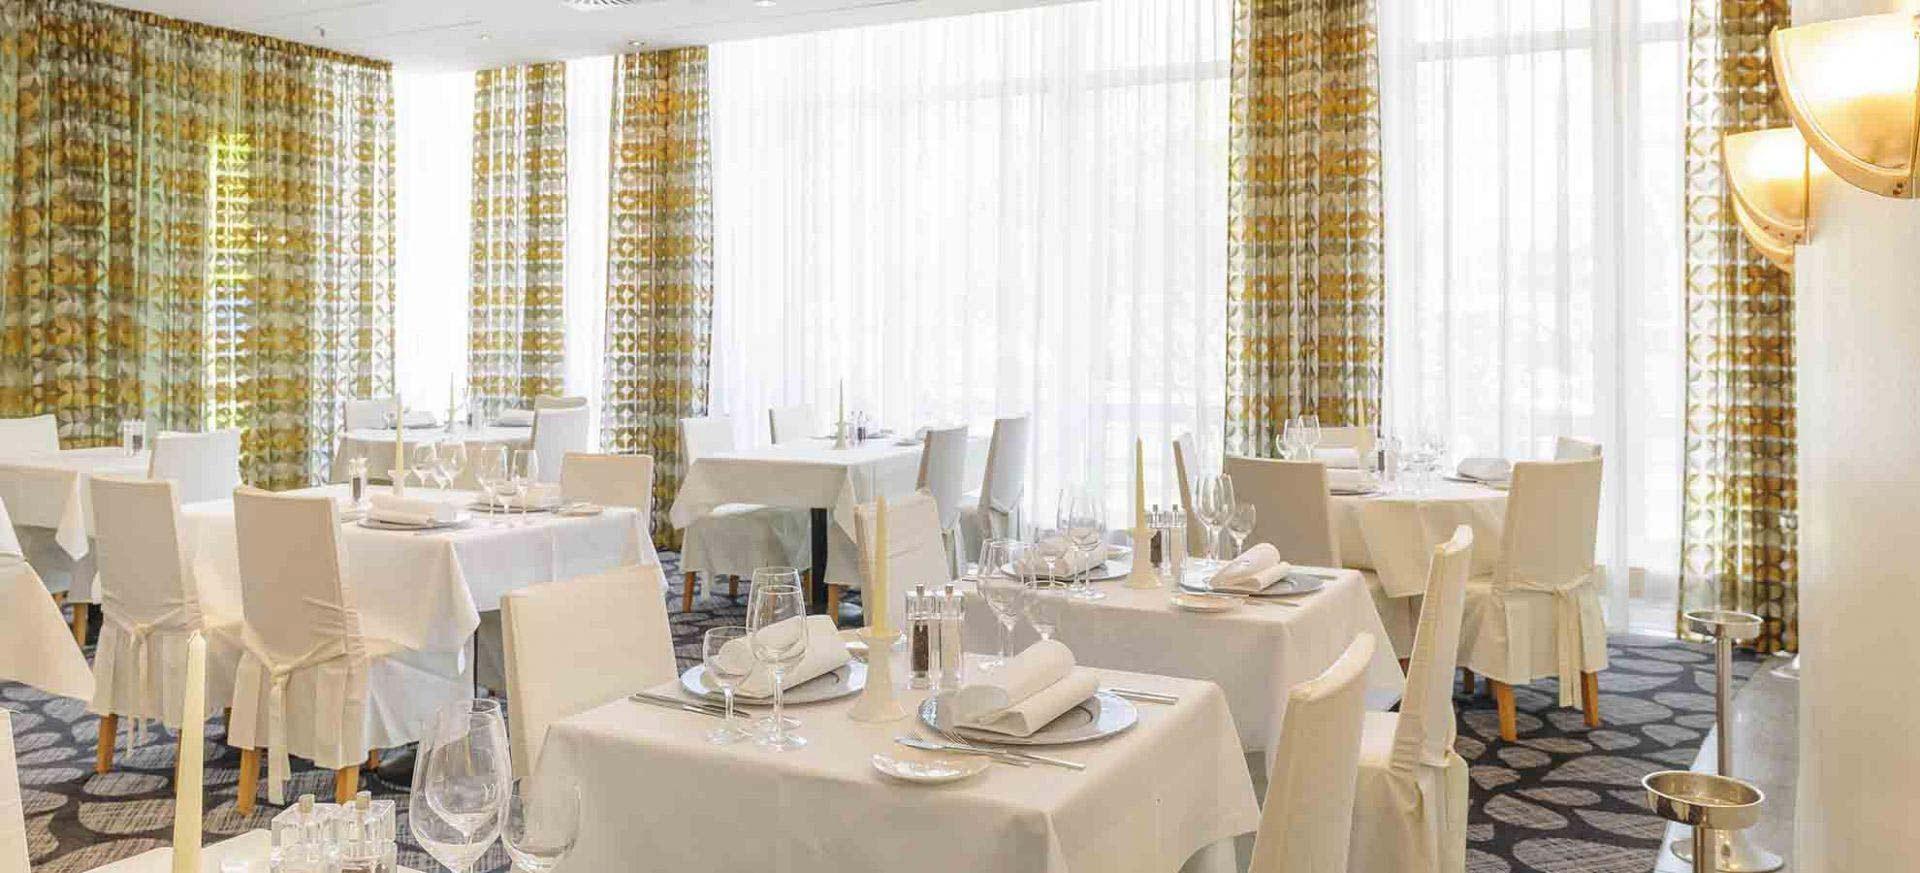 Mercure Hotel Bochum Restaurant